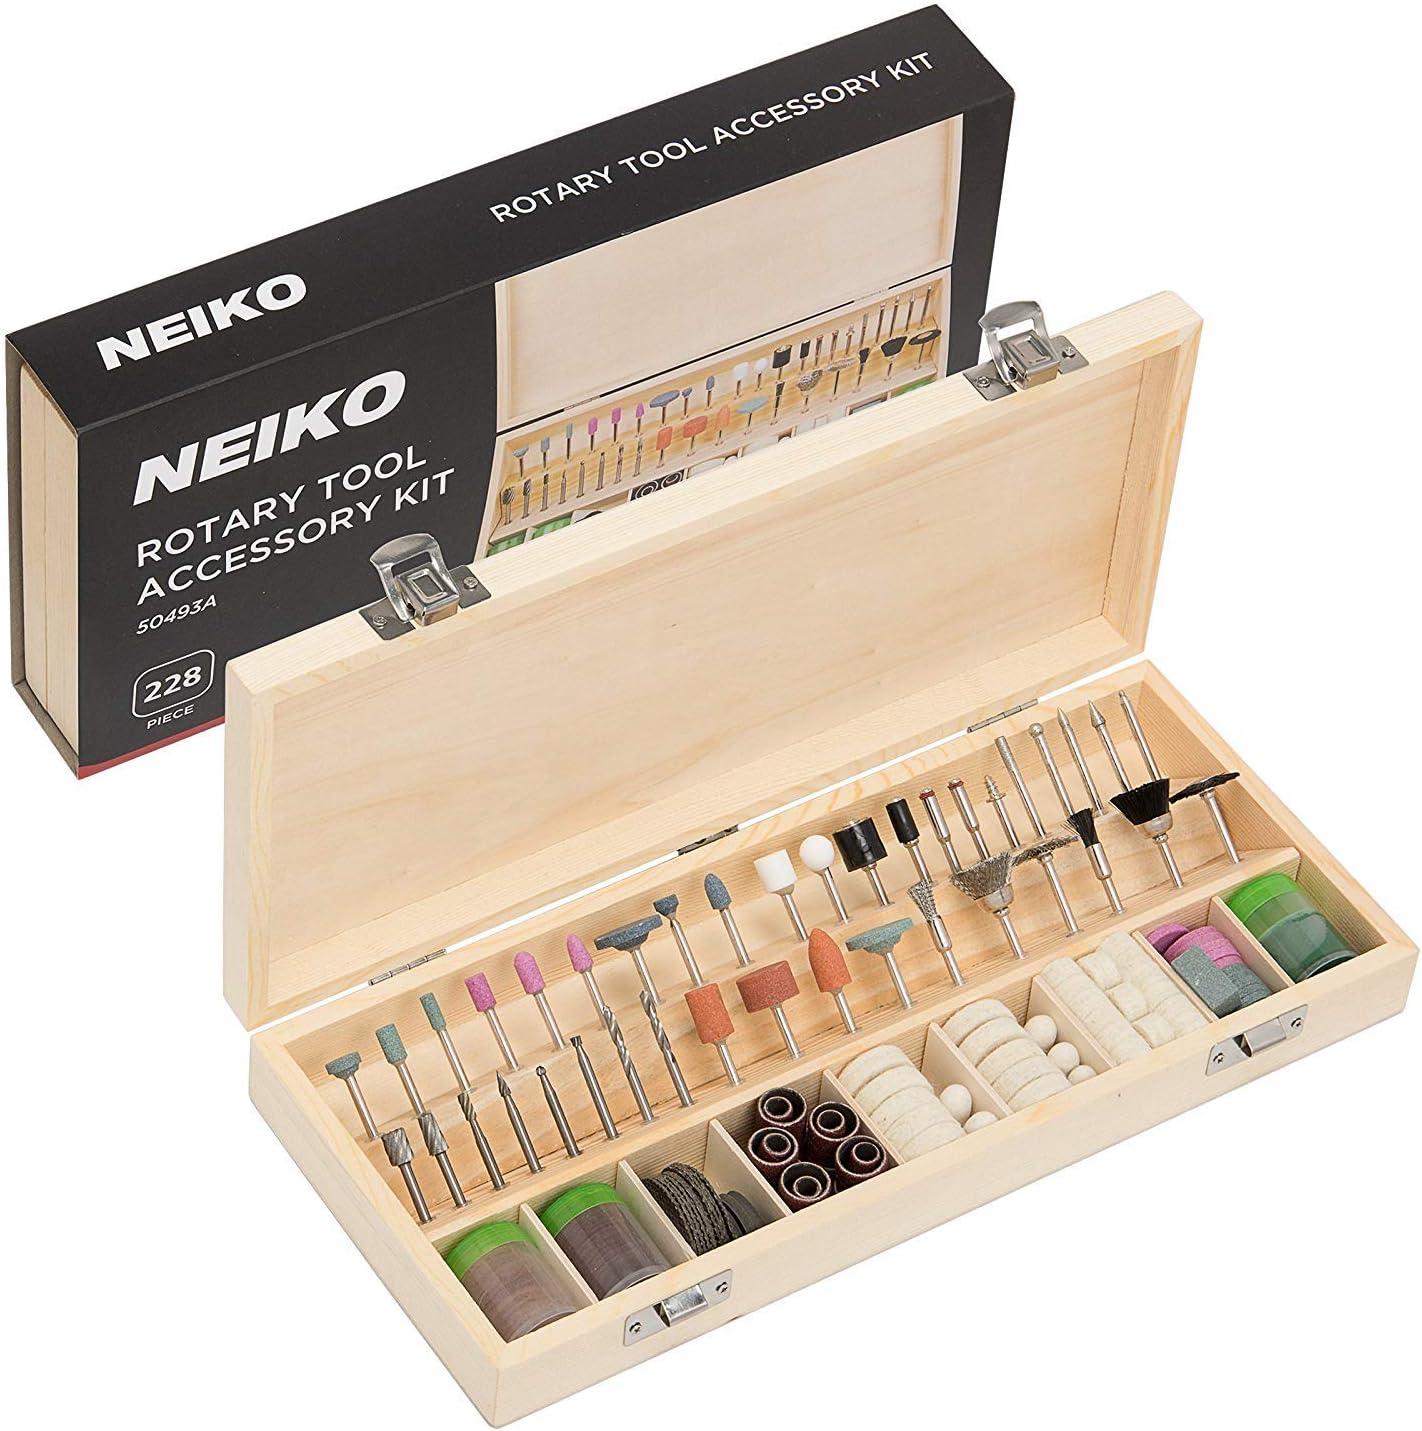 "NEIKO 50493A Rotary Nippon Fashion regular agency Tool Accessory Kit 1 228 Piece 8"" S"